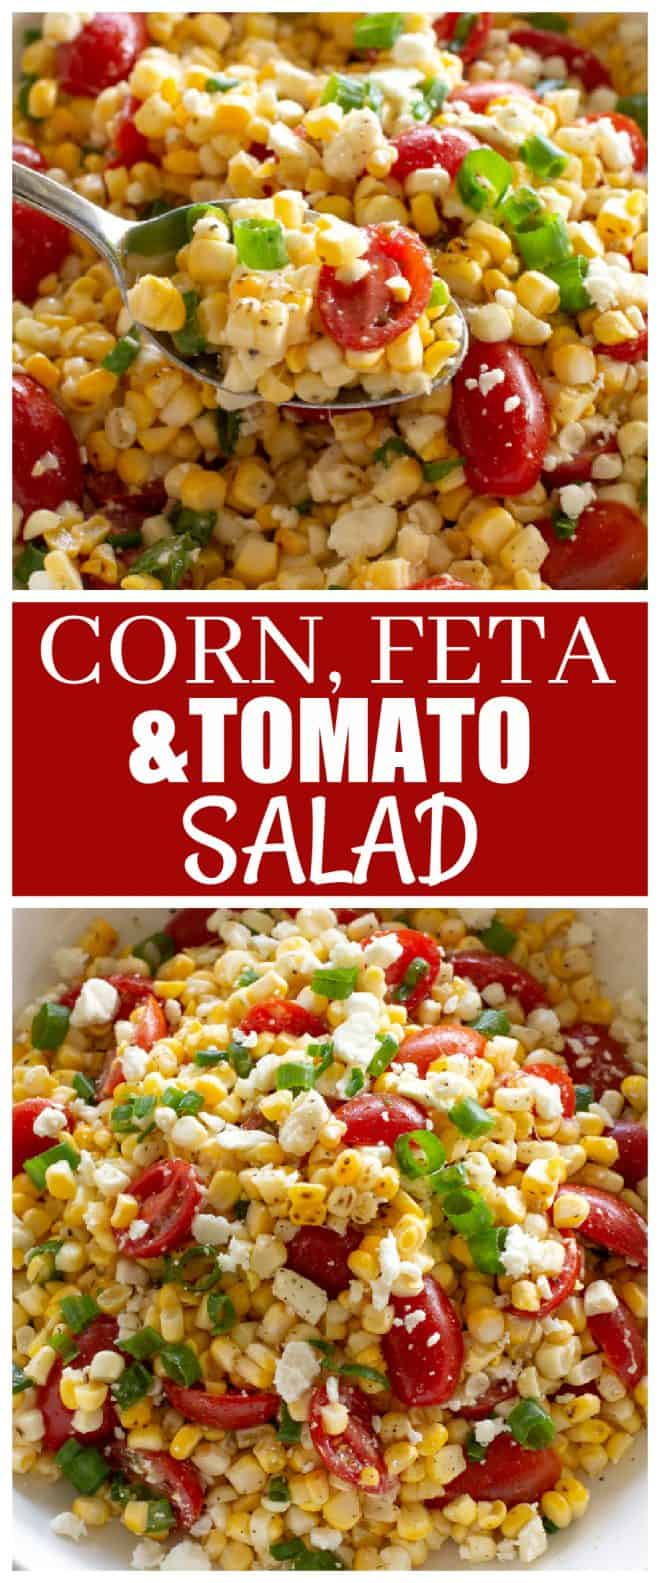 Corn, Feta, and Tomato salad